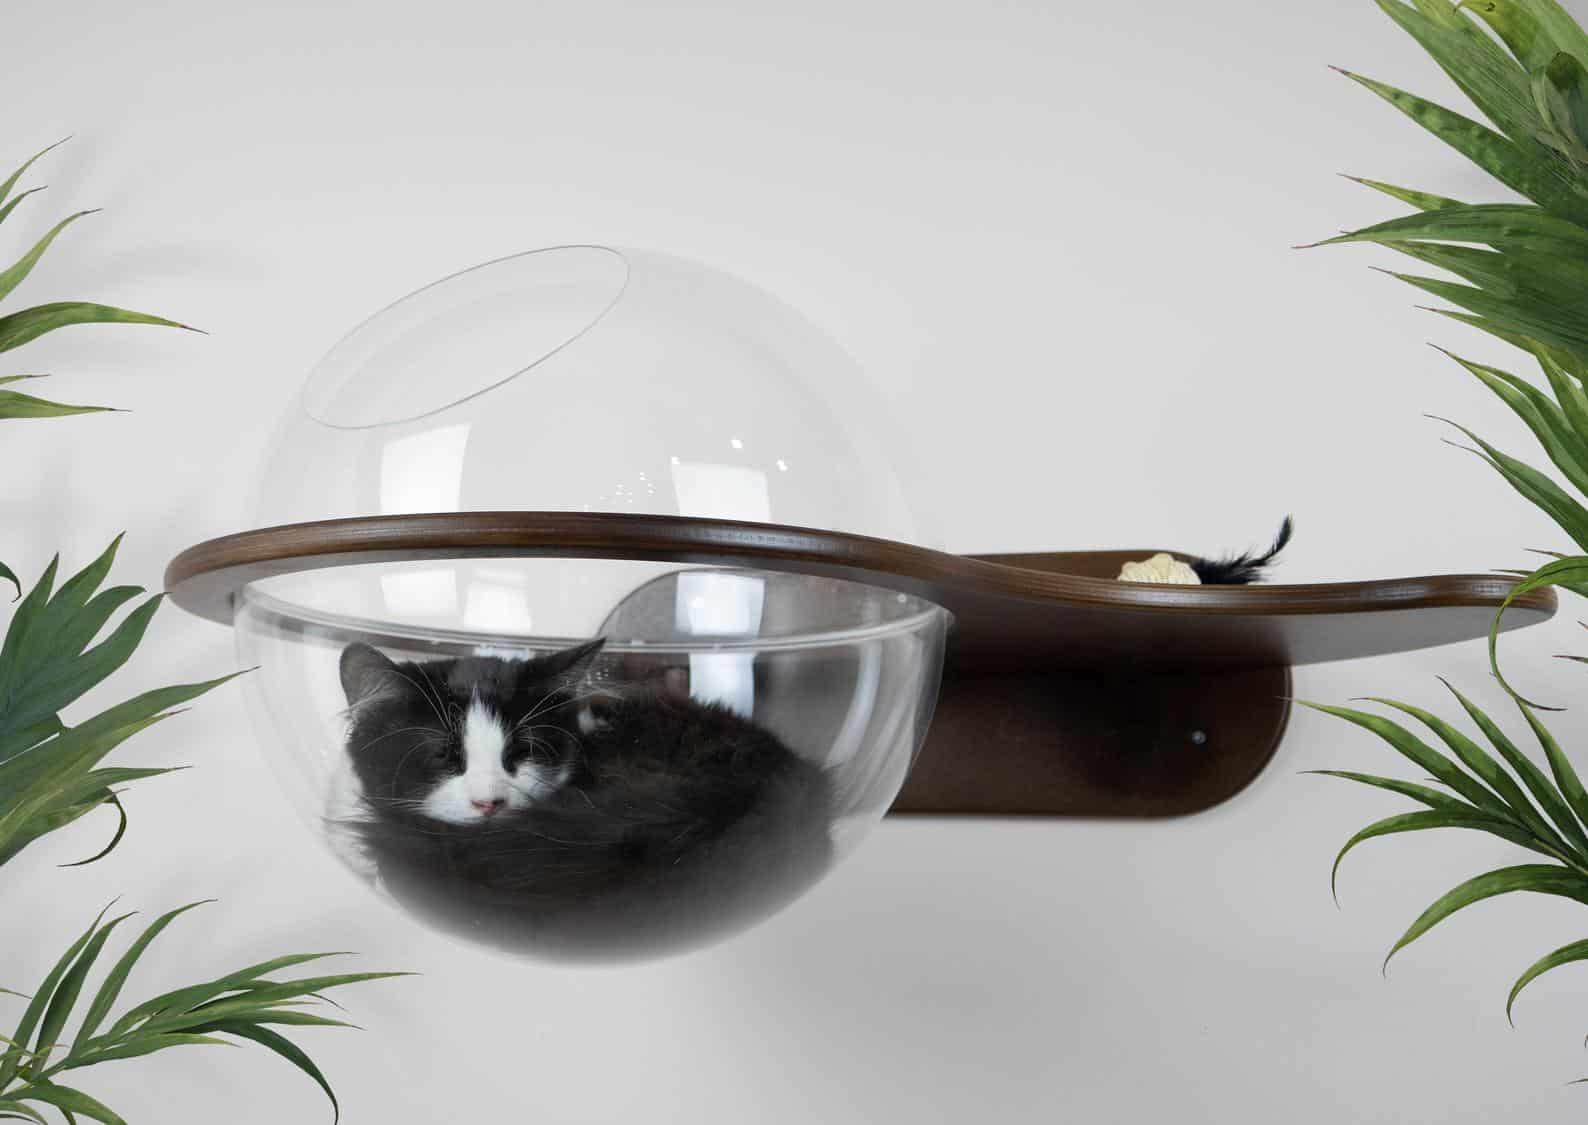 hublot capsule en boule